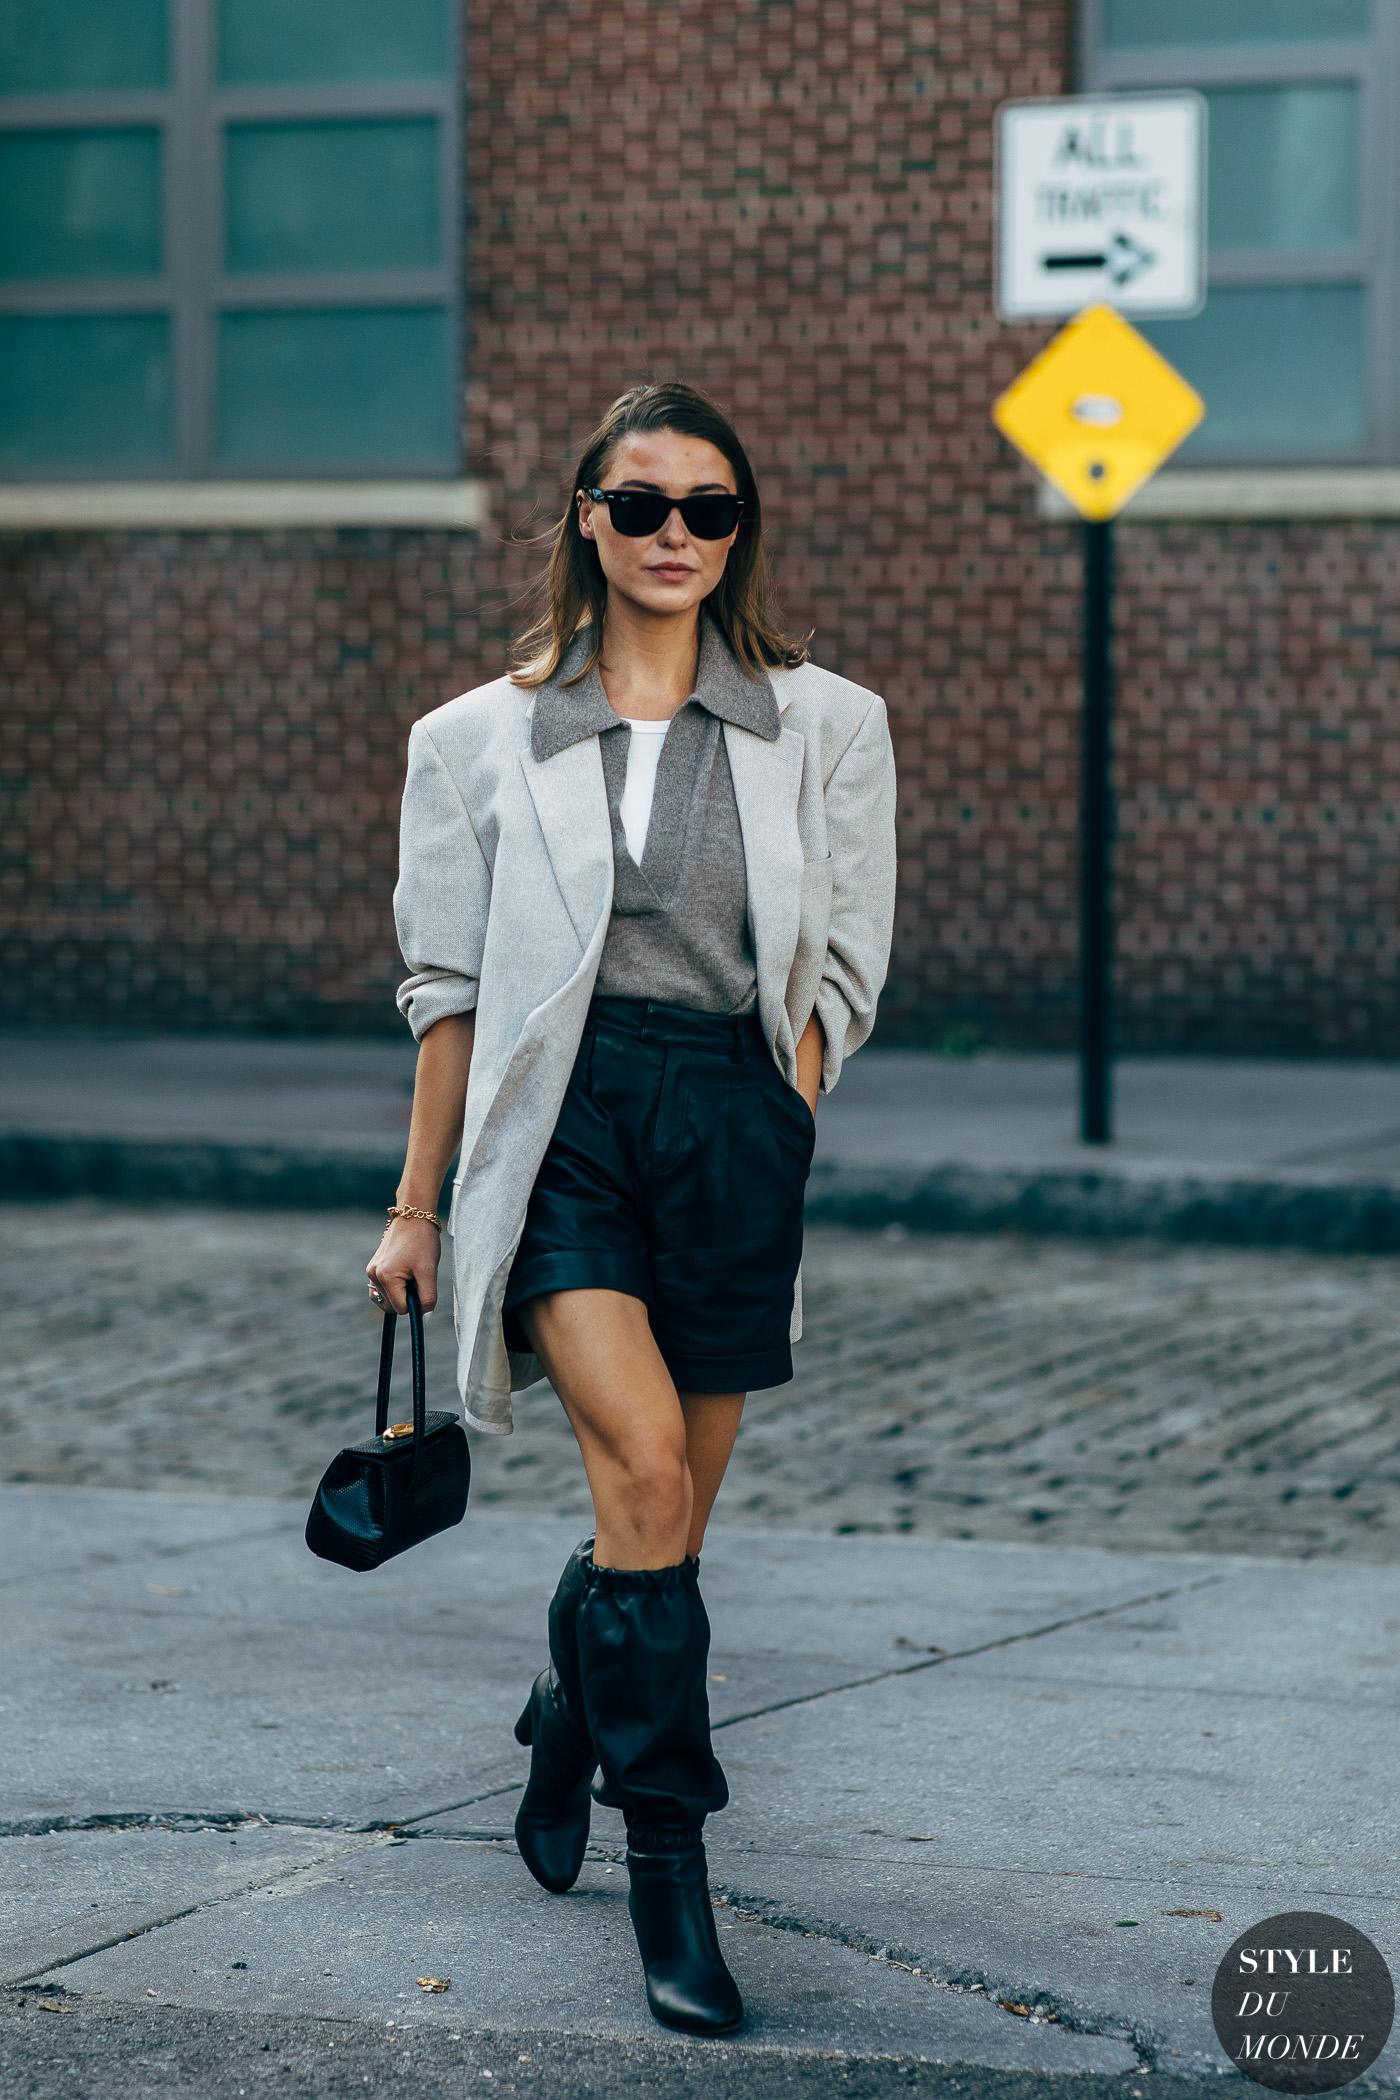 Mặc đẹp với blazer xám oversized